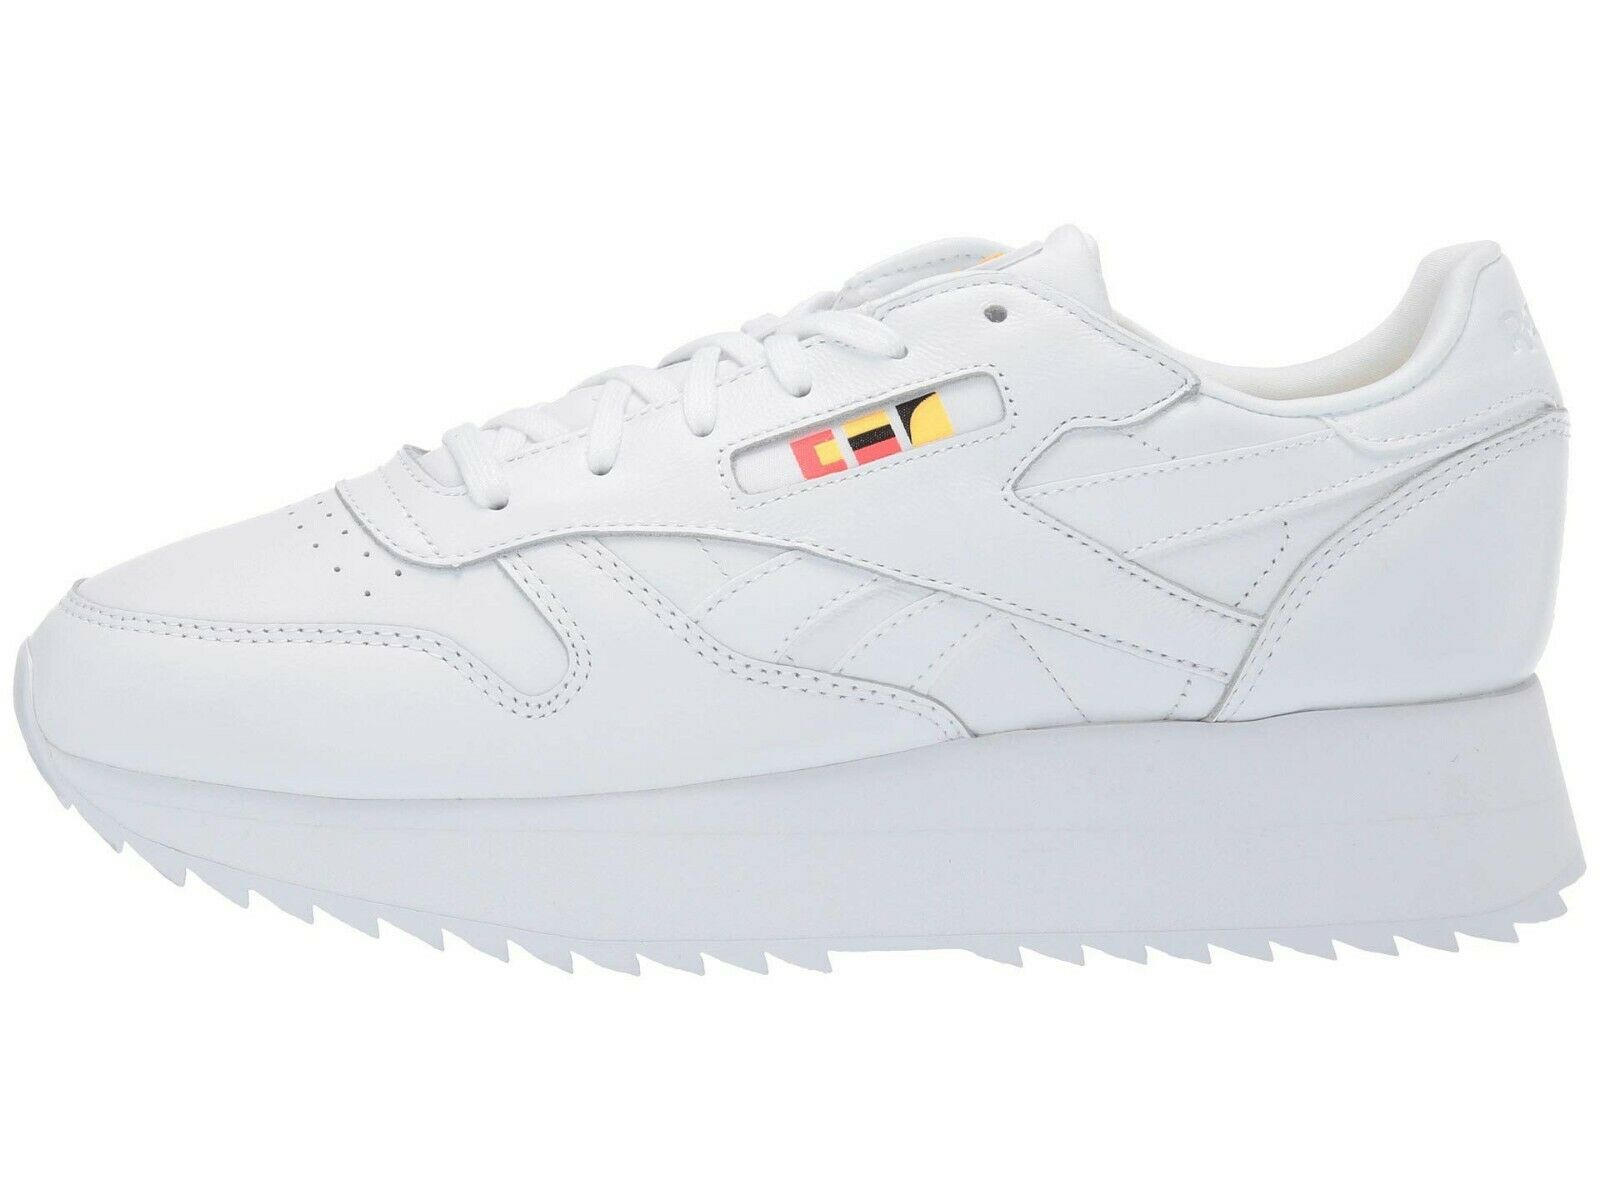 Reebok Women's REEBOK x GIGI HADID Classic Leather Double shoes White DV5391 d